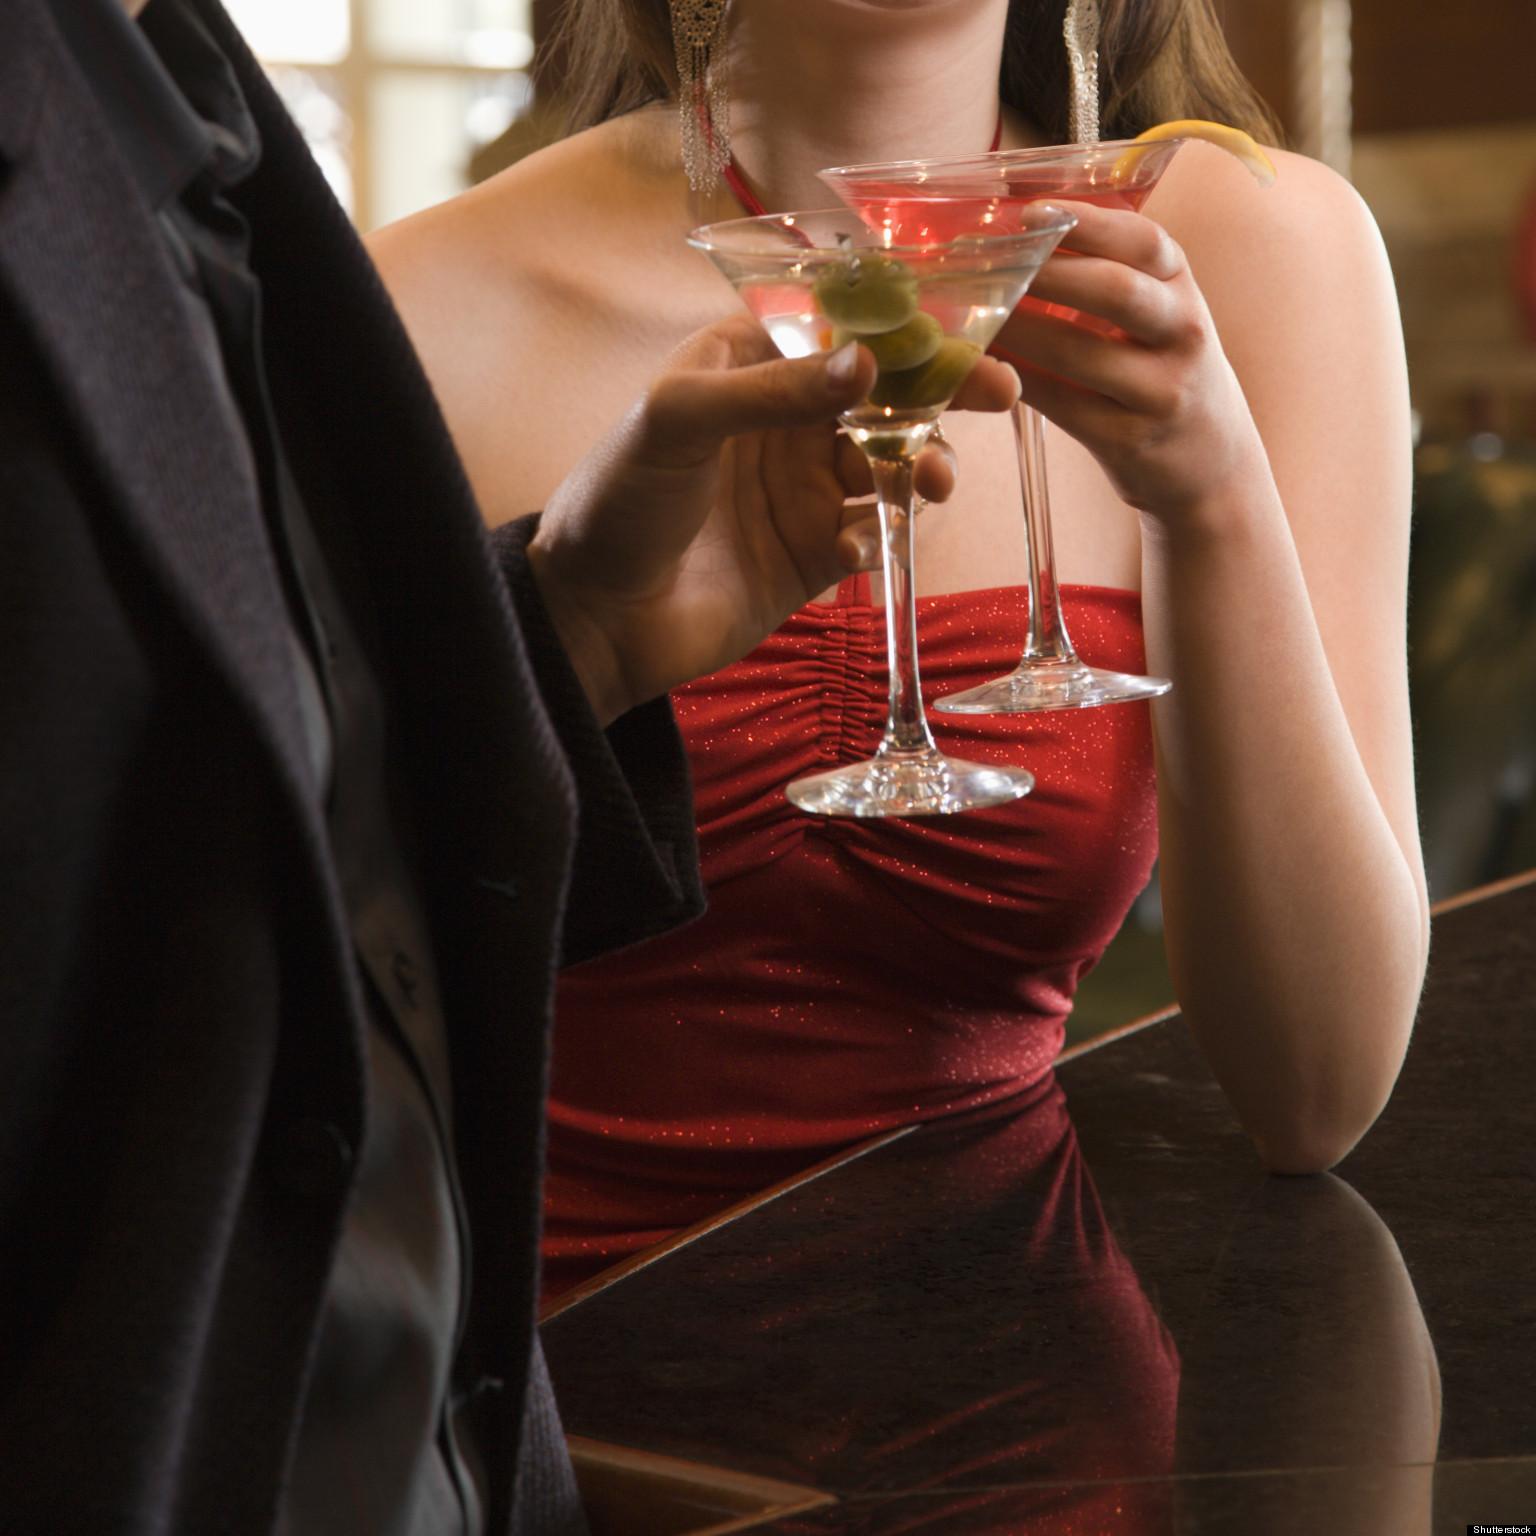 Is post dating prescriptions legal